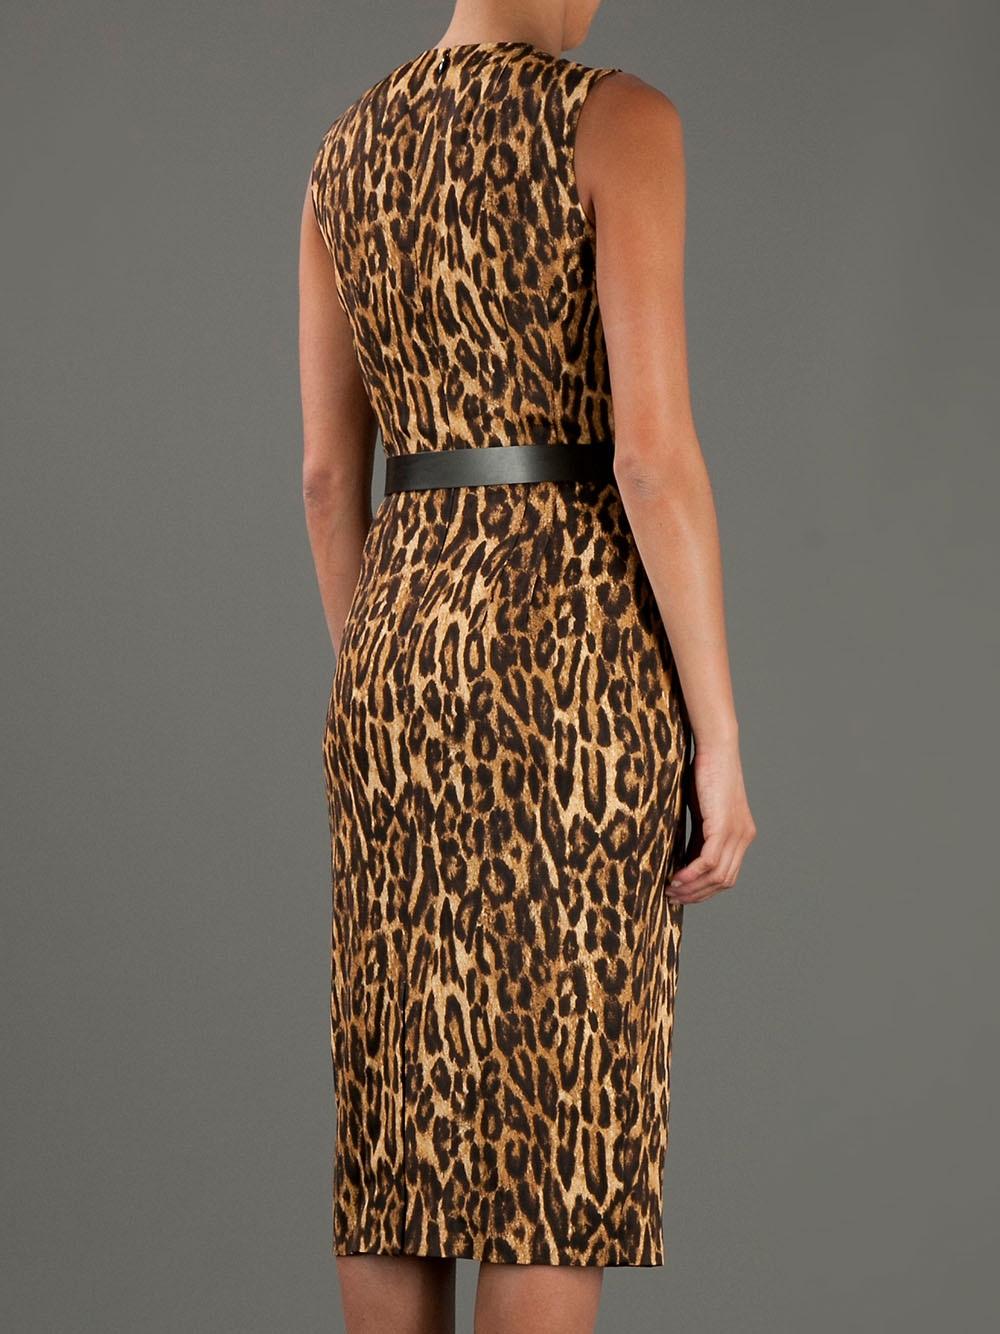 Michael Kors Leopard Print Dress In Brown Lyst